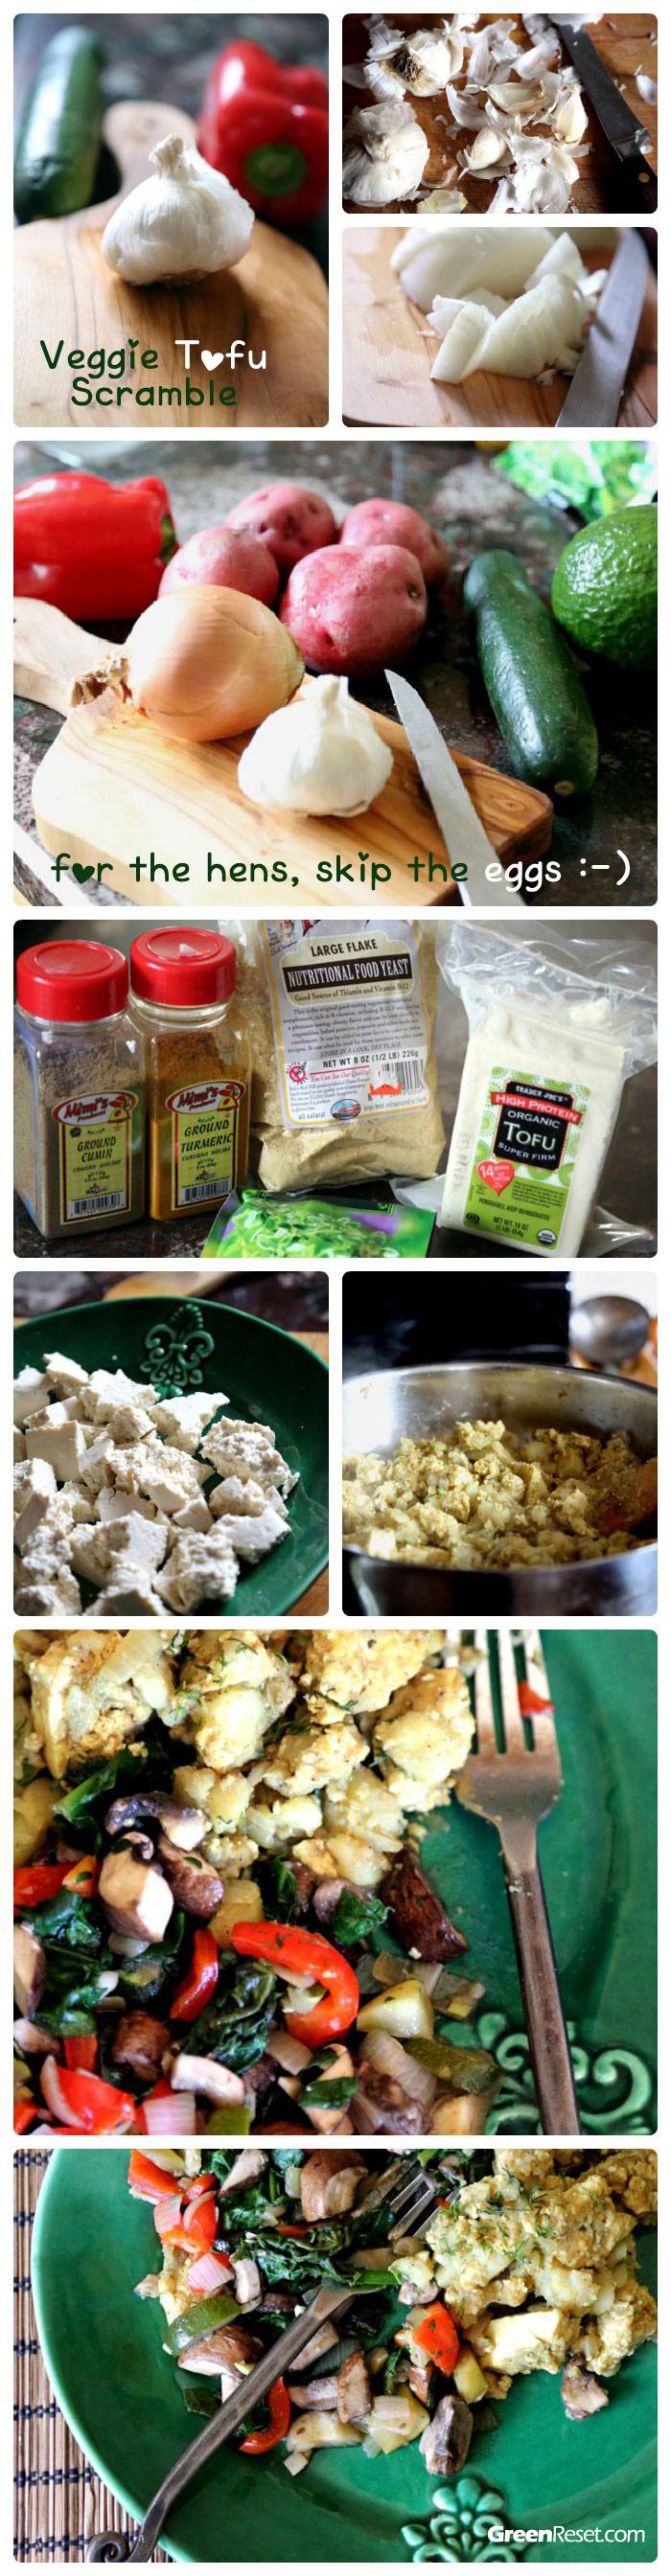 Making tofu scramble